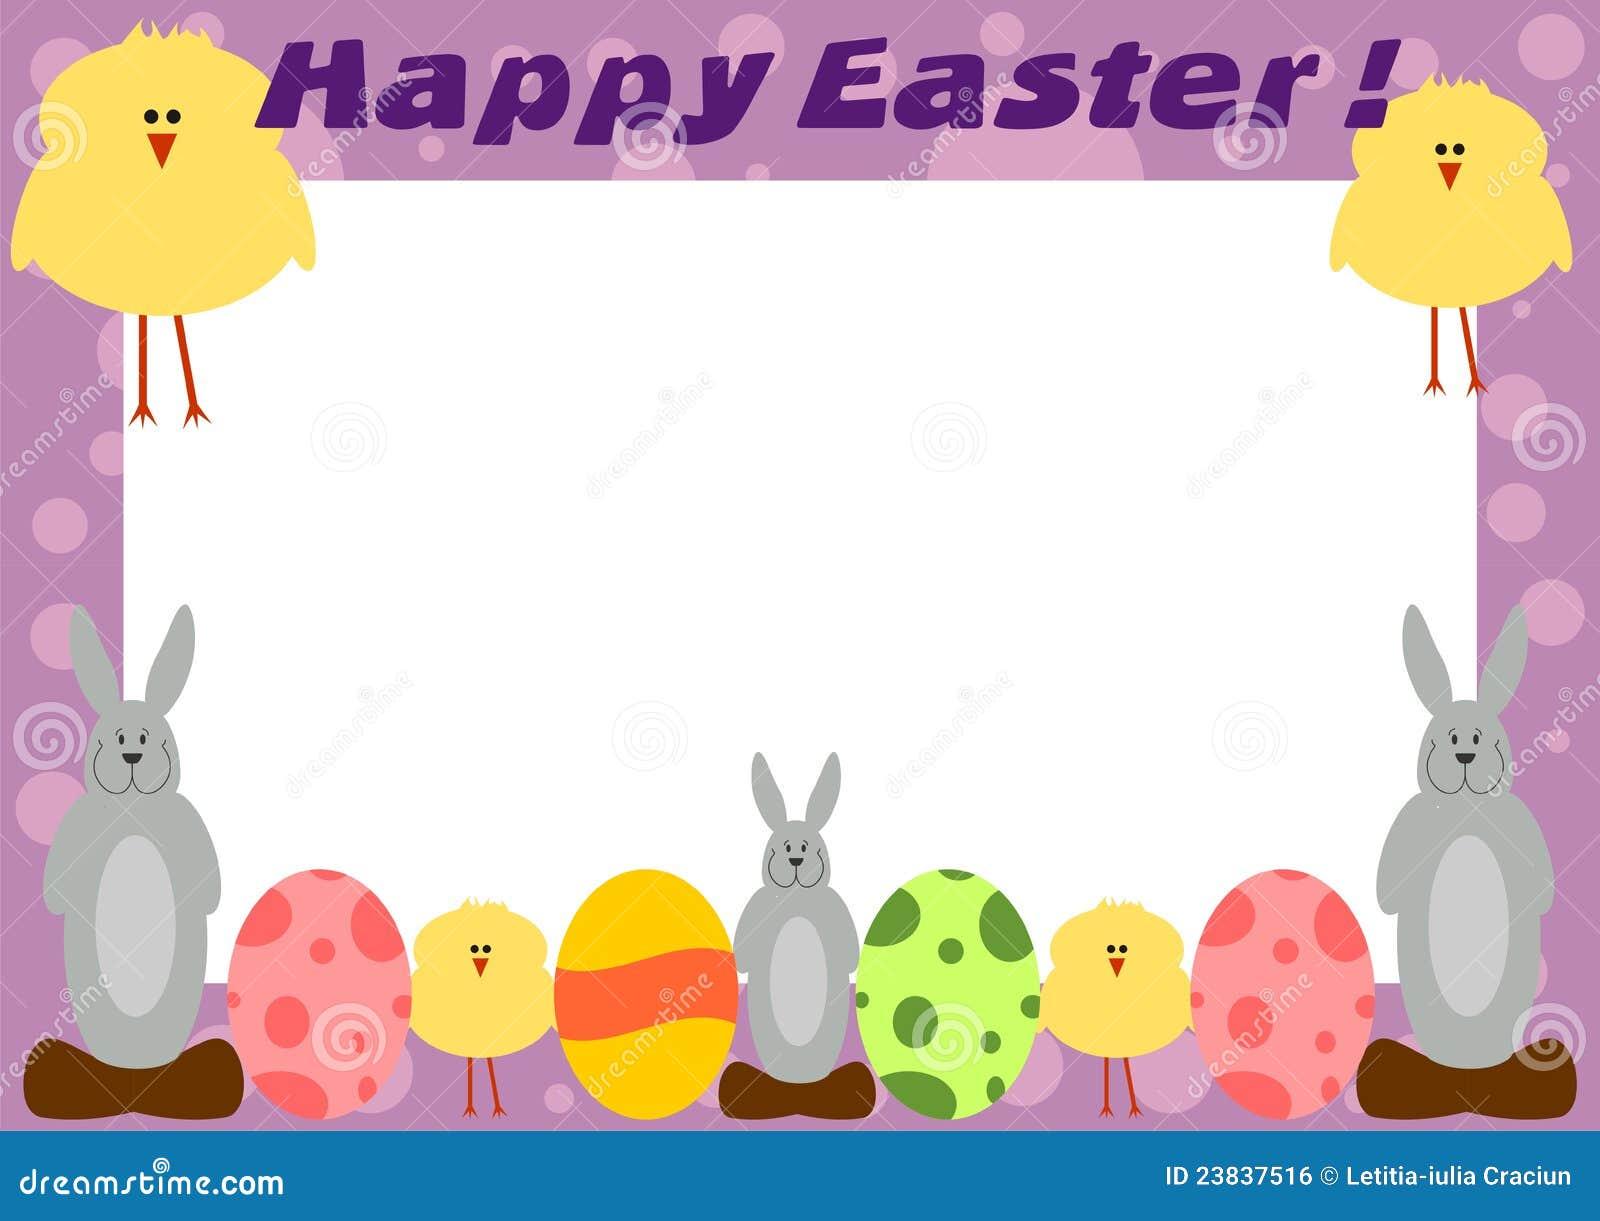 happy easter frame card - Easter Photo Frames